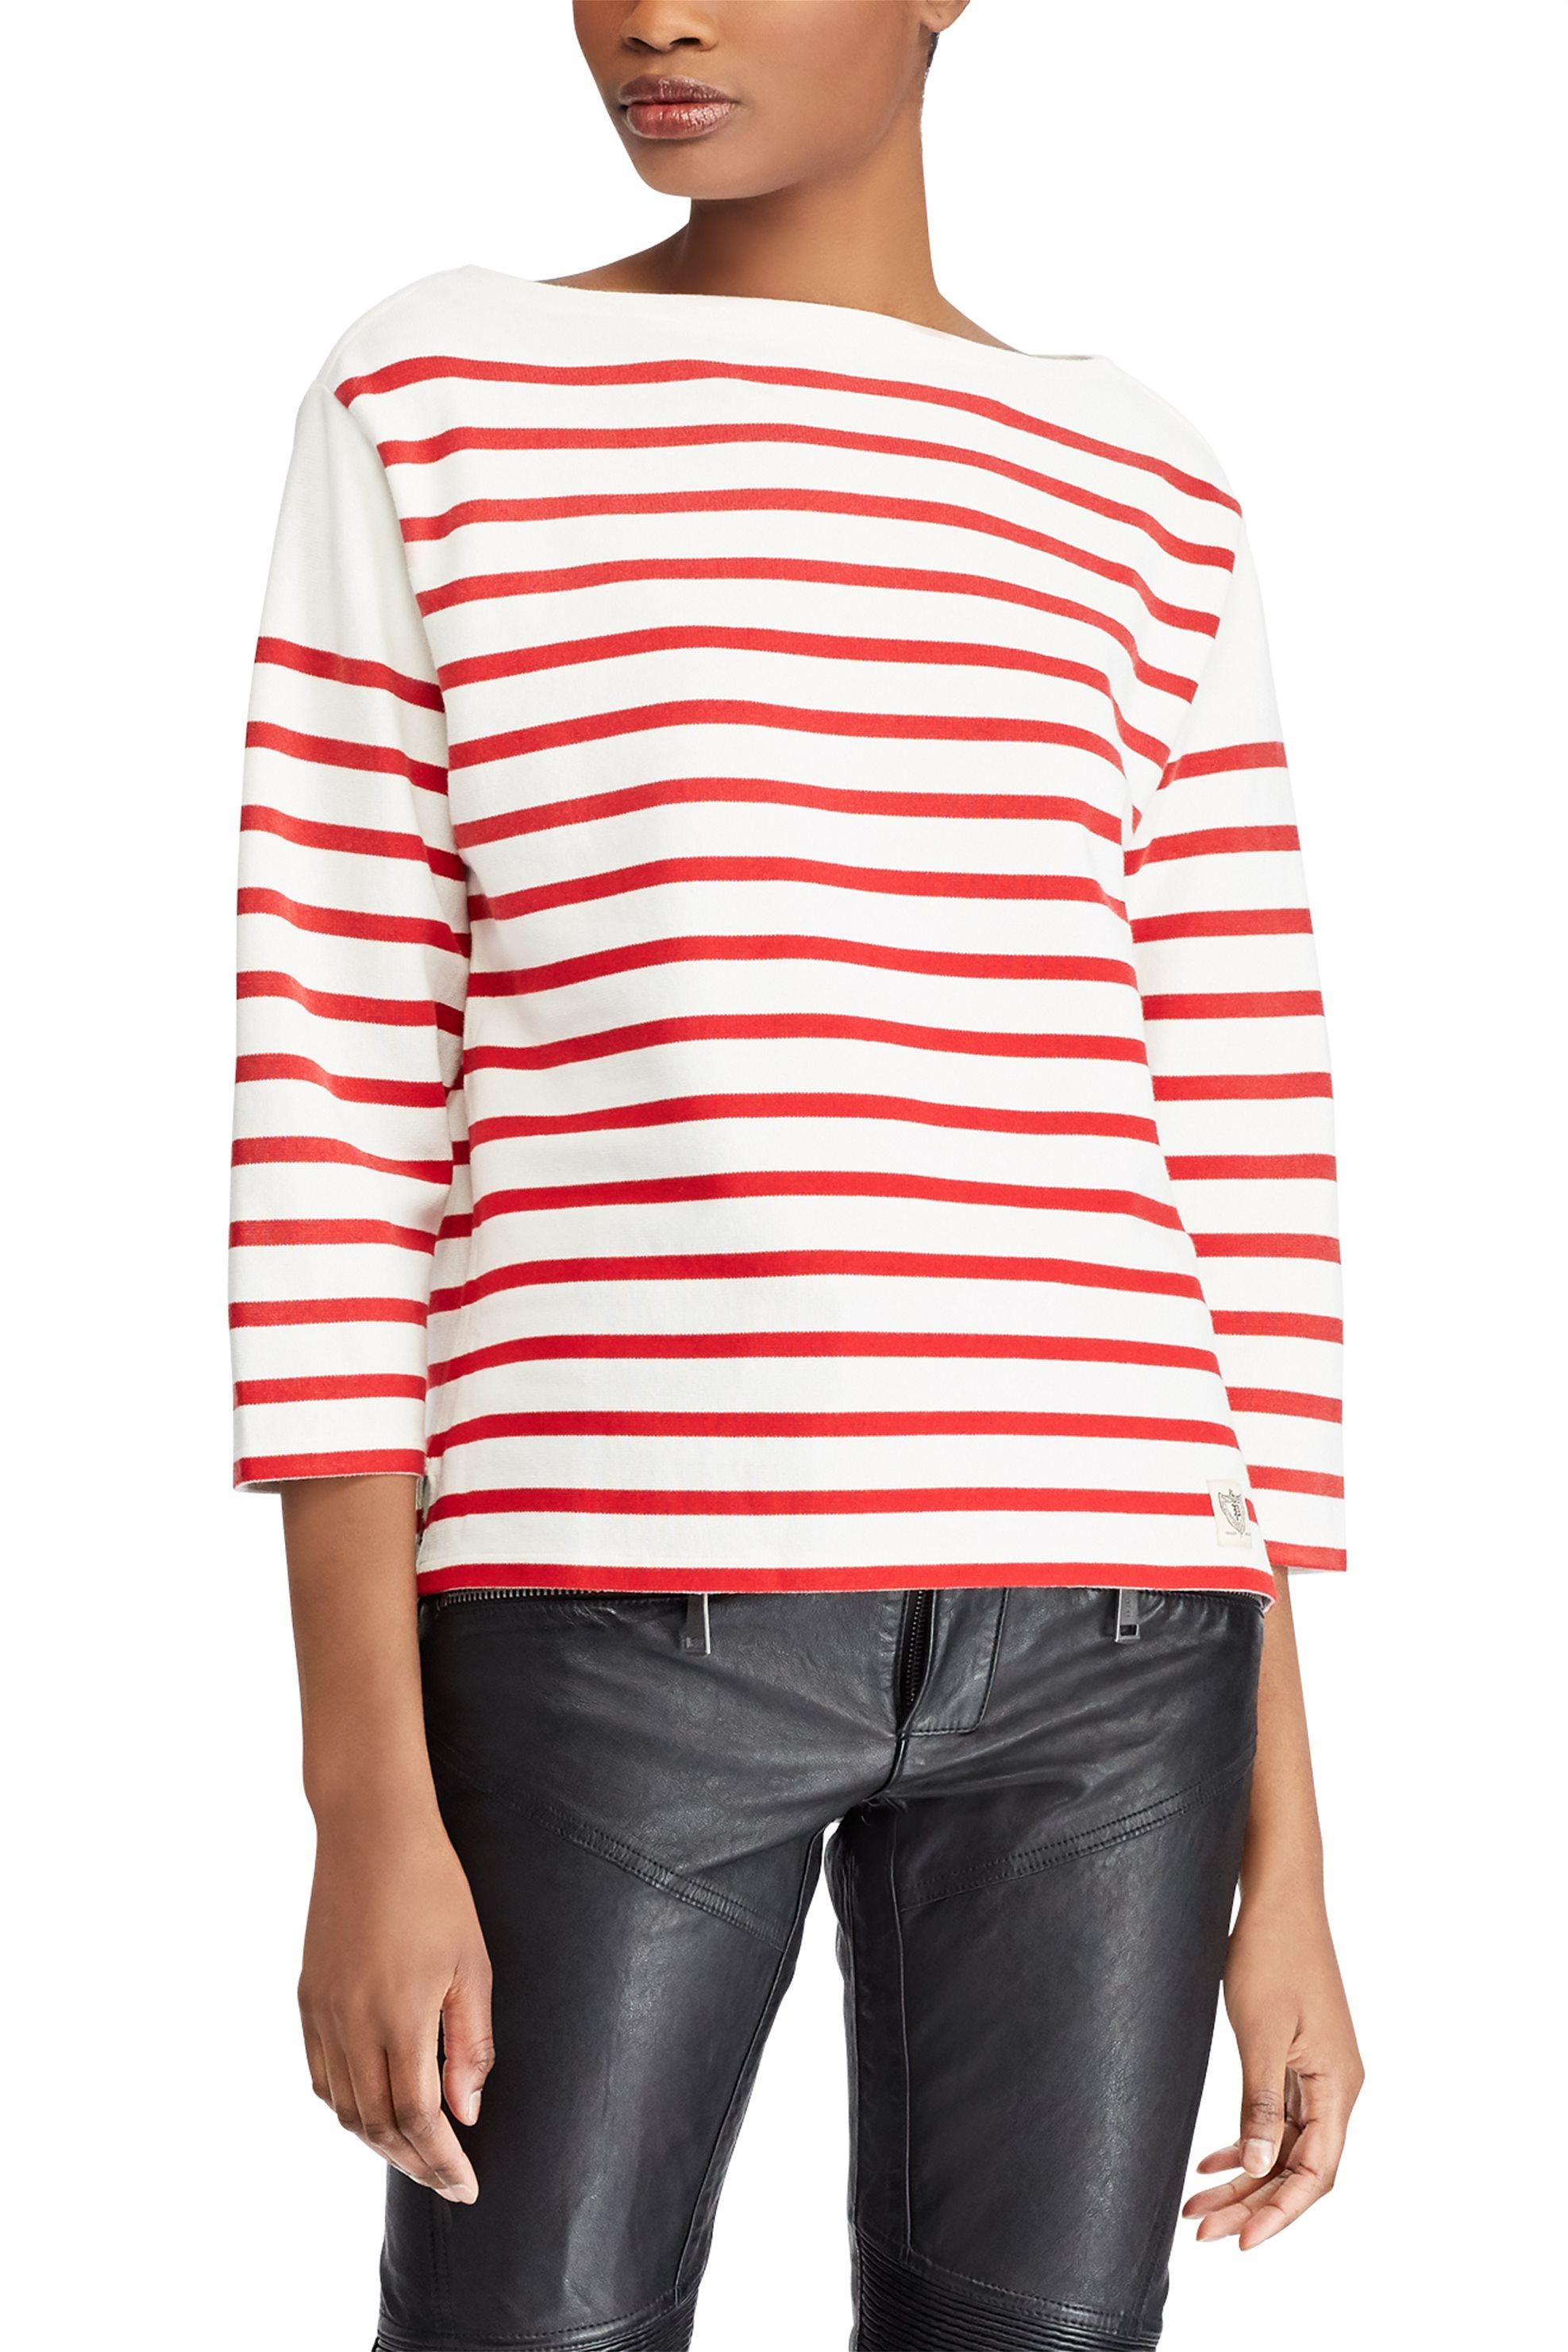 Polo Ralph Lauren γυναικεία μπλούζα ριγέ Concert Jersey Graphic T-Shirt red - 21 γυναικα   ρουχα   tops   μπλούζες   casual